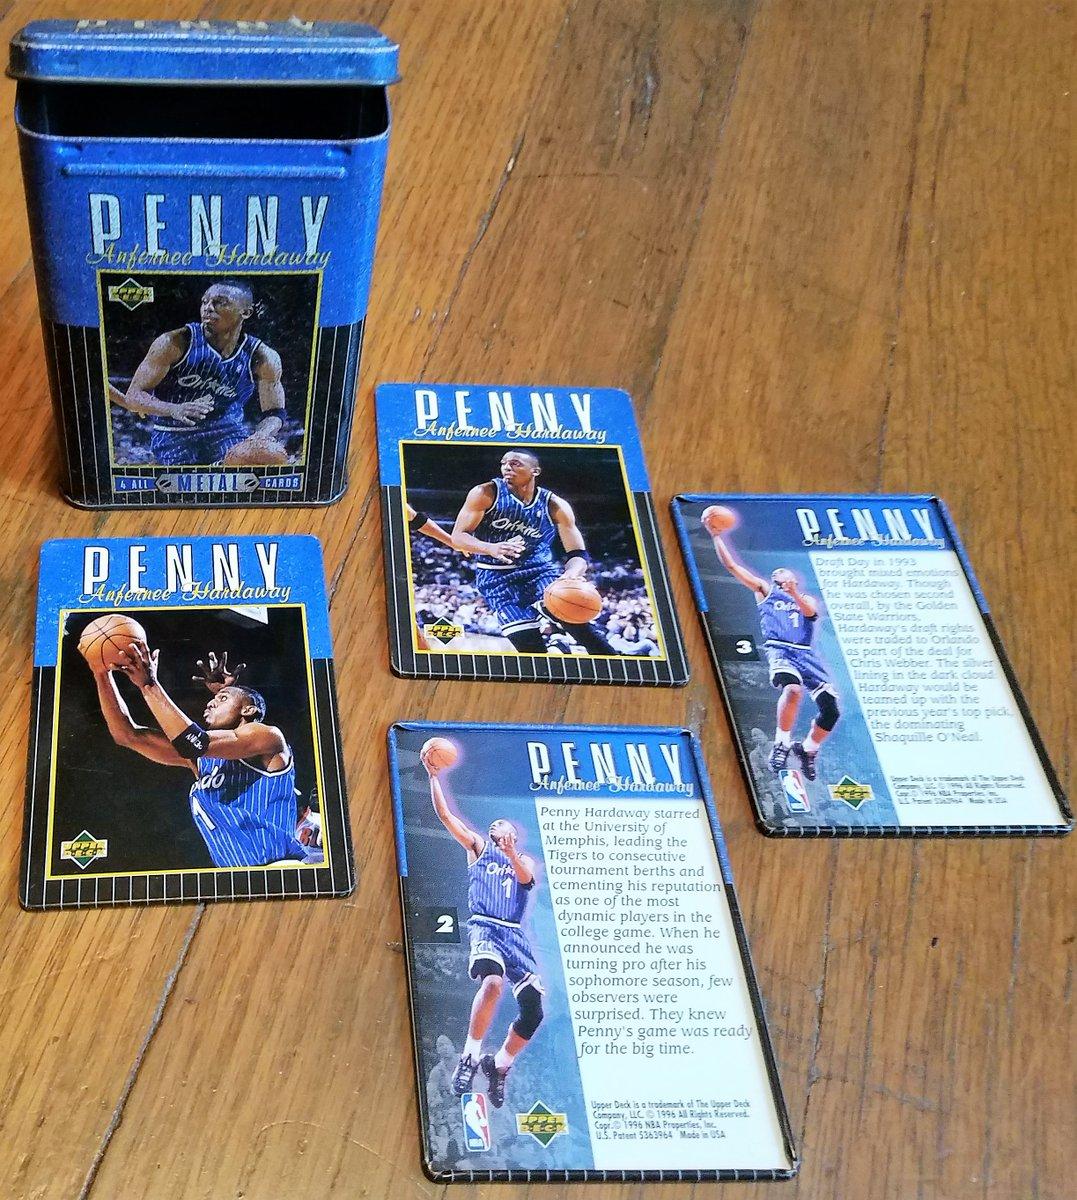 #Magic  PENNY AFERNEE HARDAWAY (4) ALL METAL CARDS 1996 UPPER DECK/#NBA #SportsCards  https://t.co/tg0iCGRtXb https://t.co/kGnPU45joi